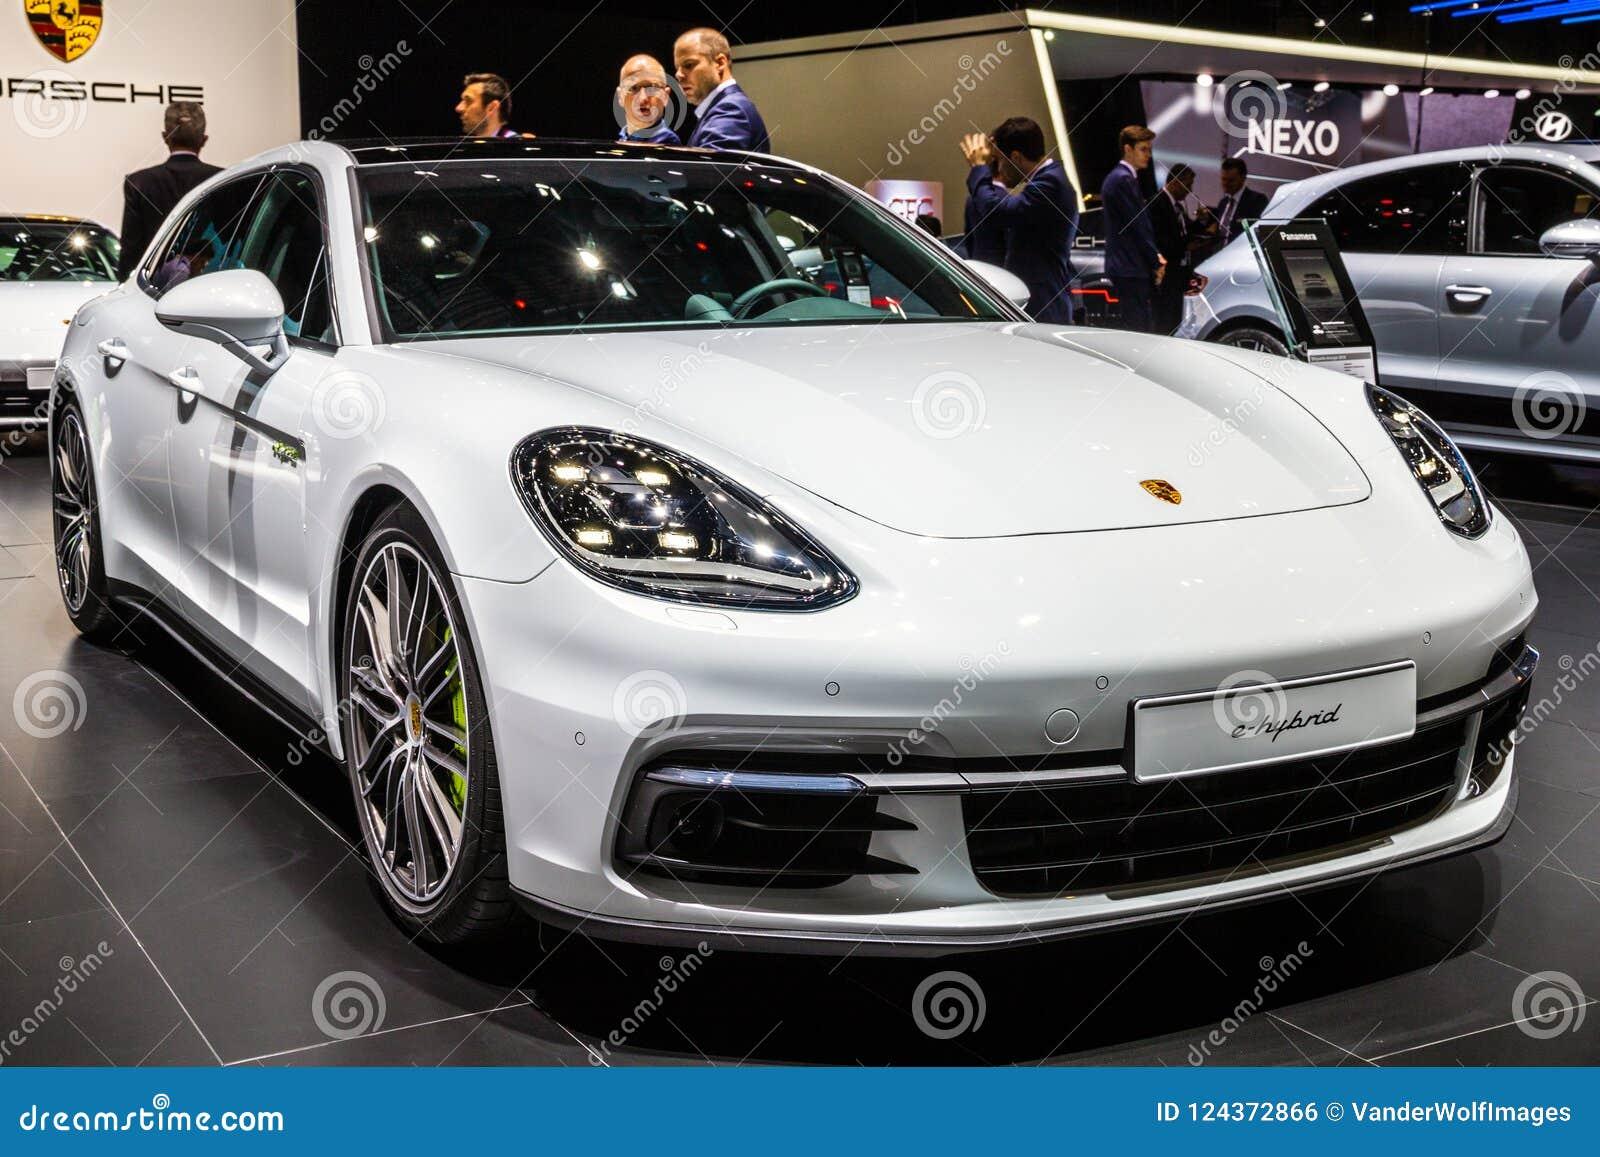 2018 Porsche Panamera Turbo S E Hybrid Sports Car Editorial